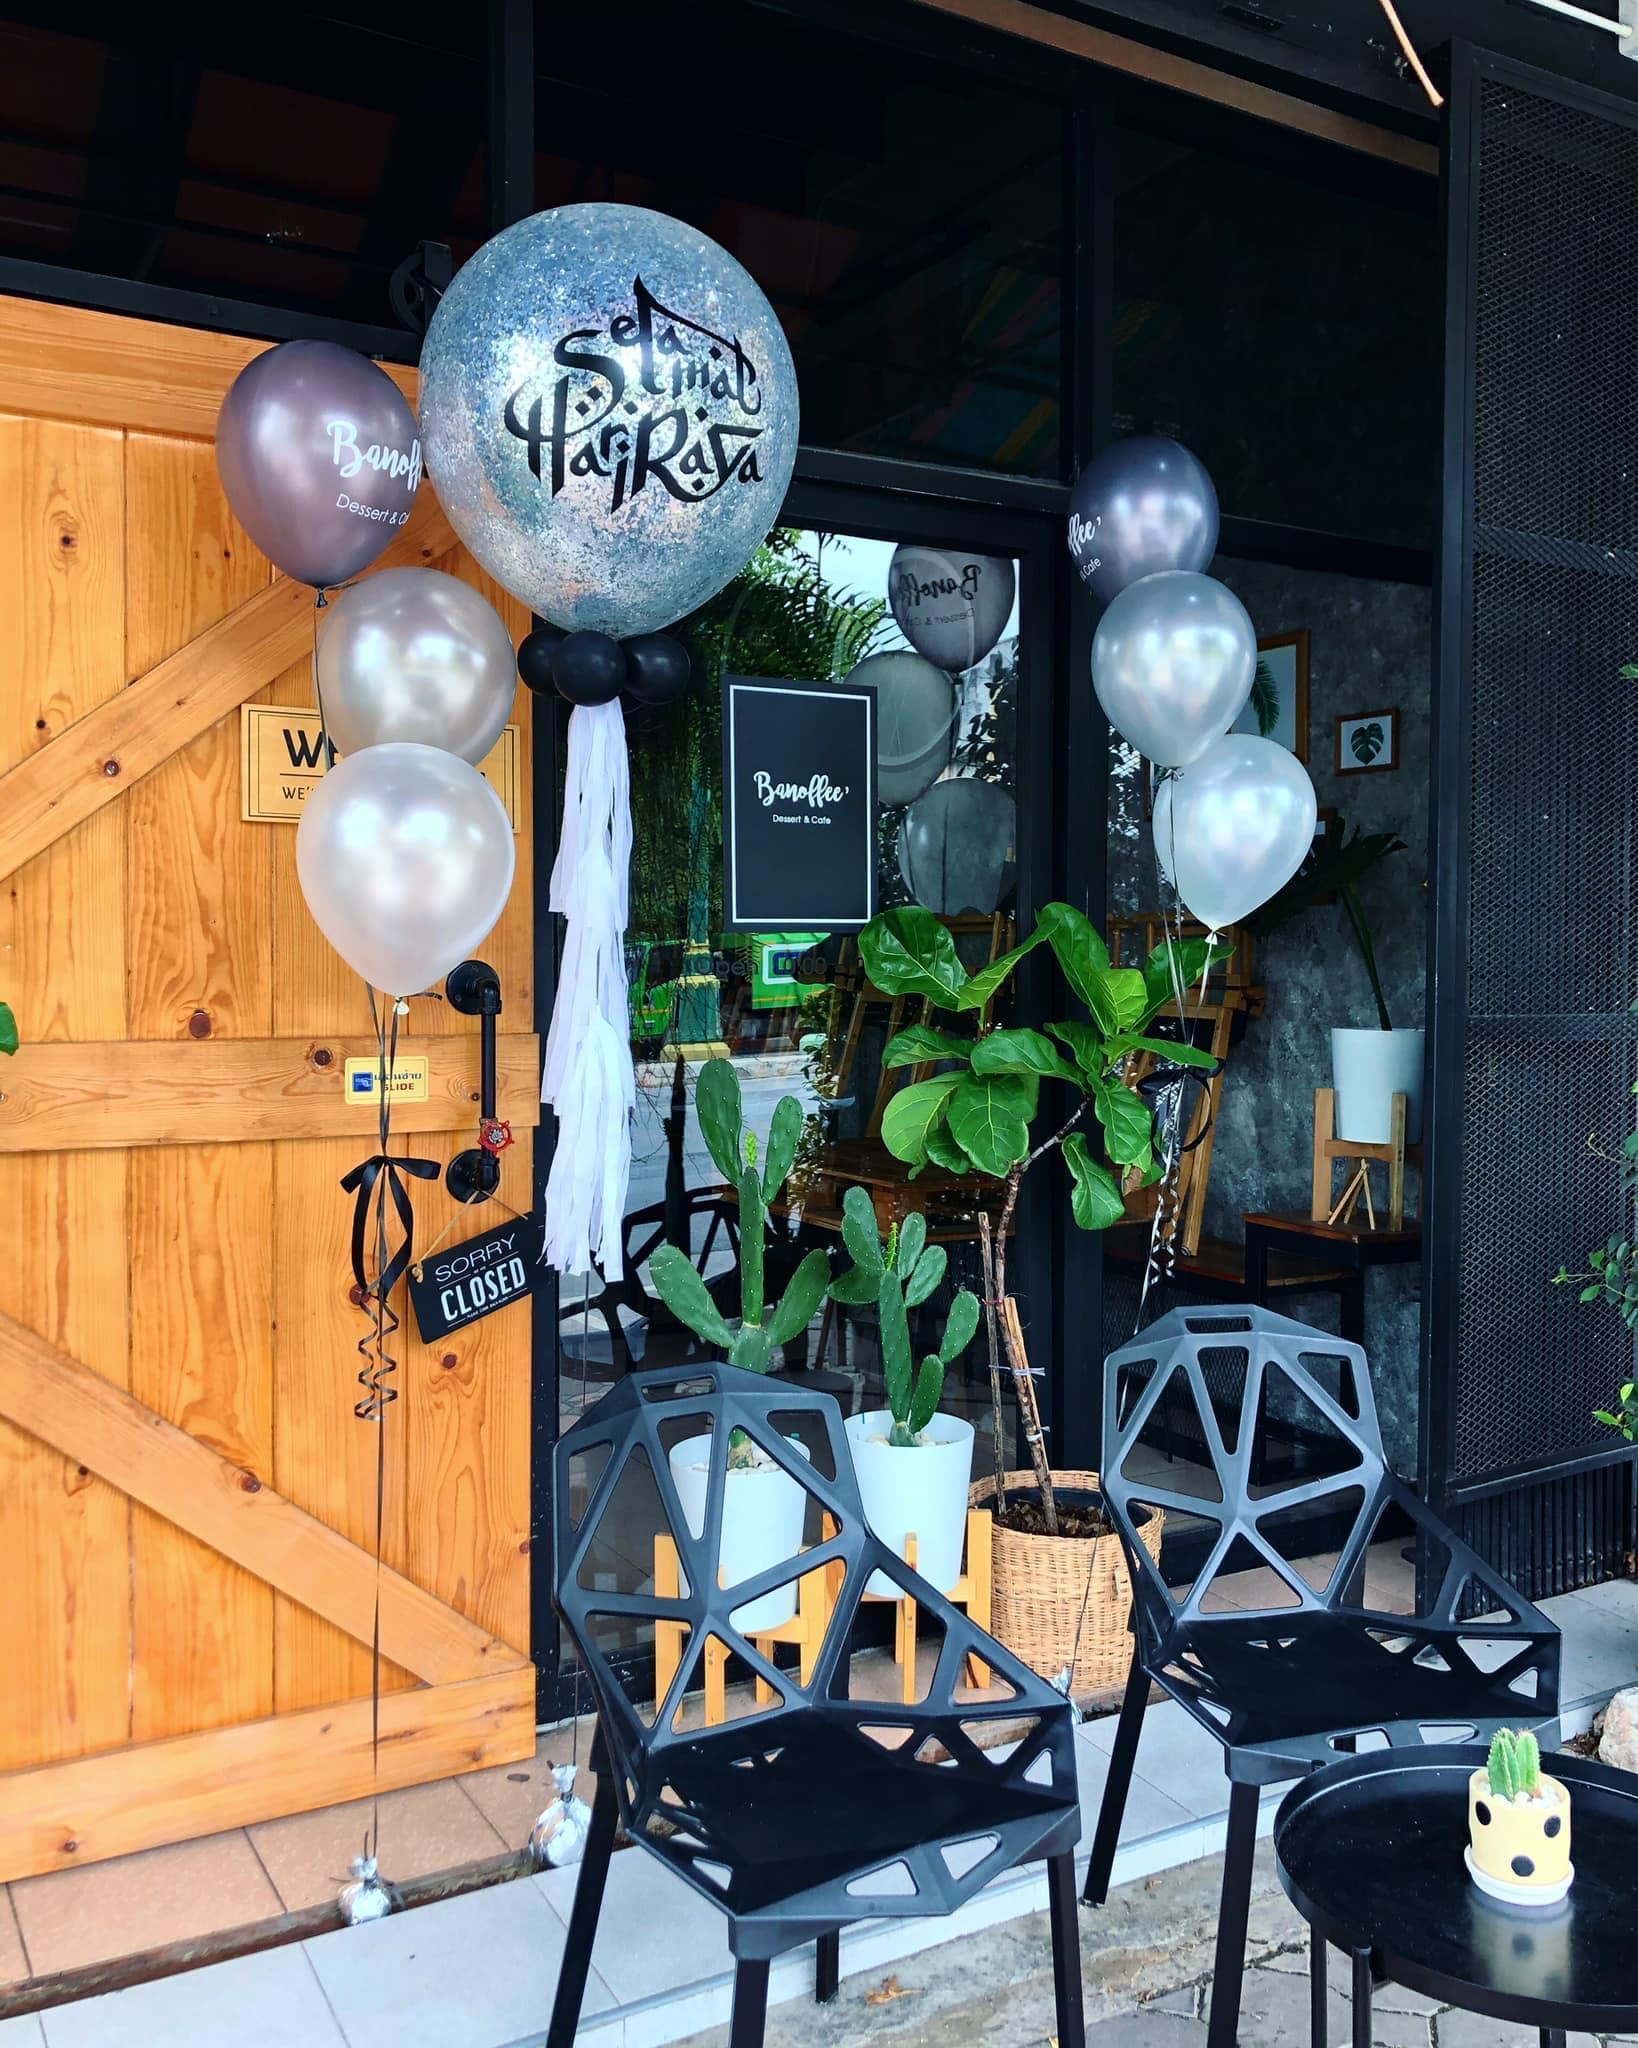 2. Banoffee' Dessert & Cafe 03